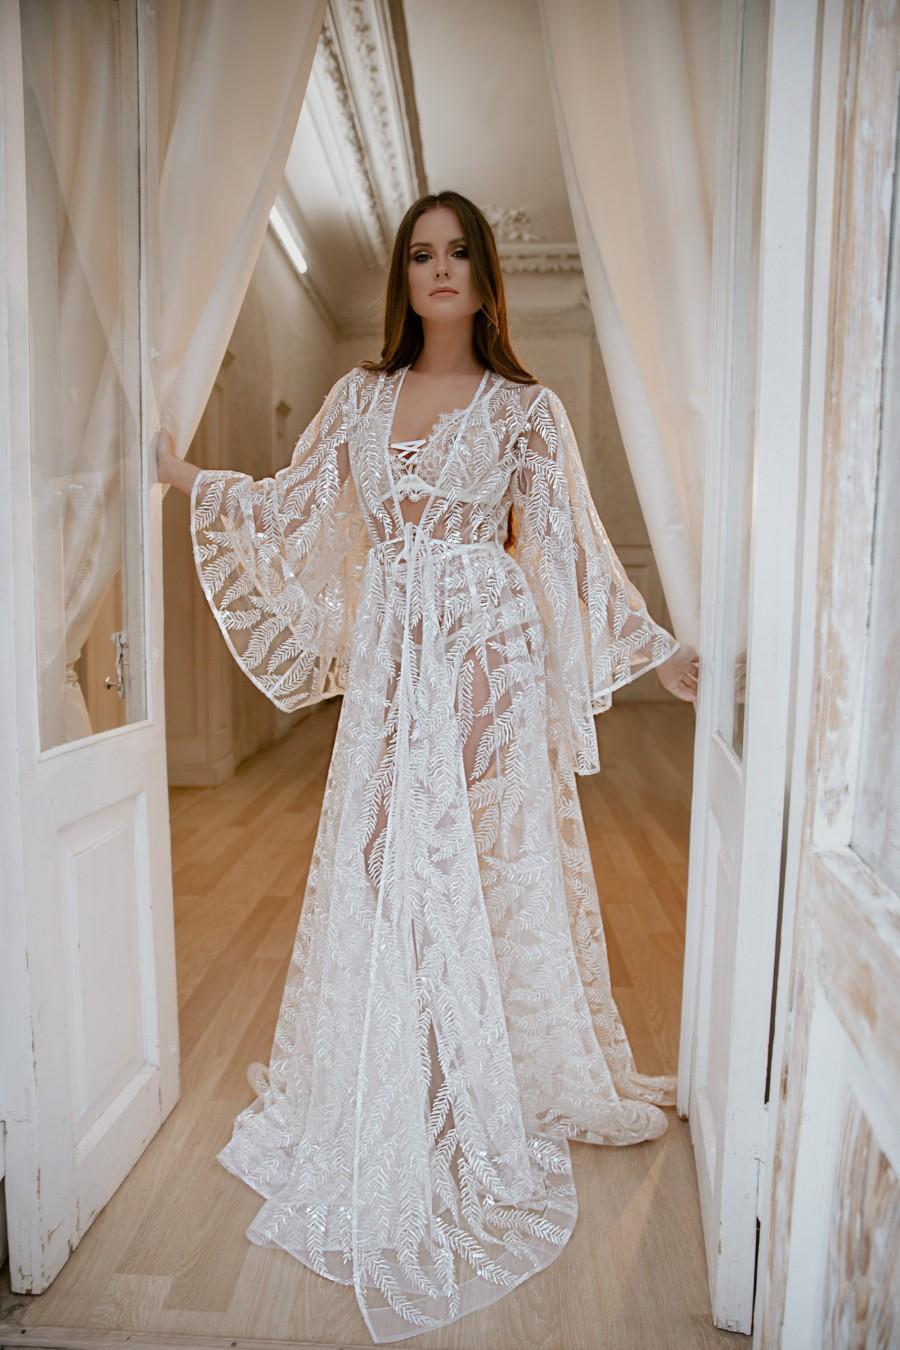 Wedding - Wedding long bridal robe, Boudoir lingerie, Long robe bride, Boudoir wedding gown, Bridal robe, Sheer robe lingerie, Bridal lingerie